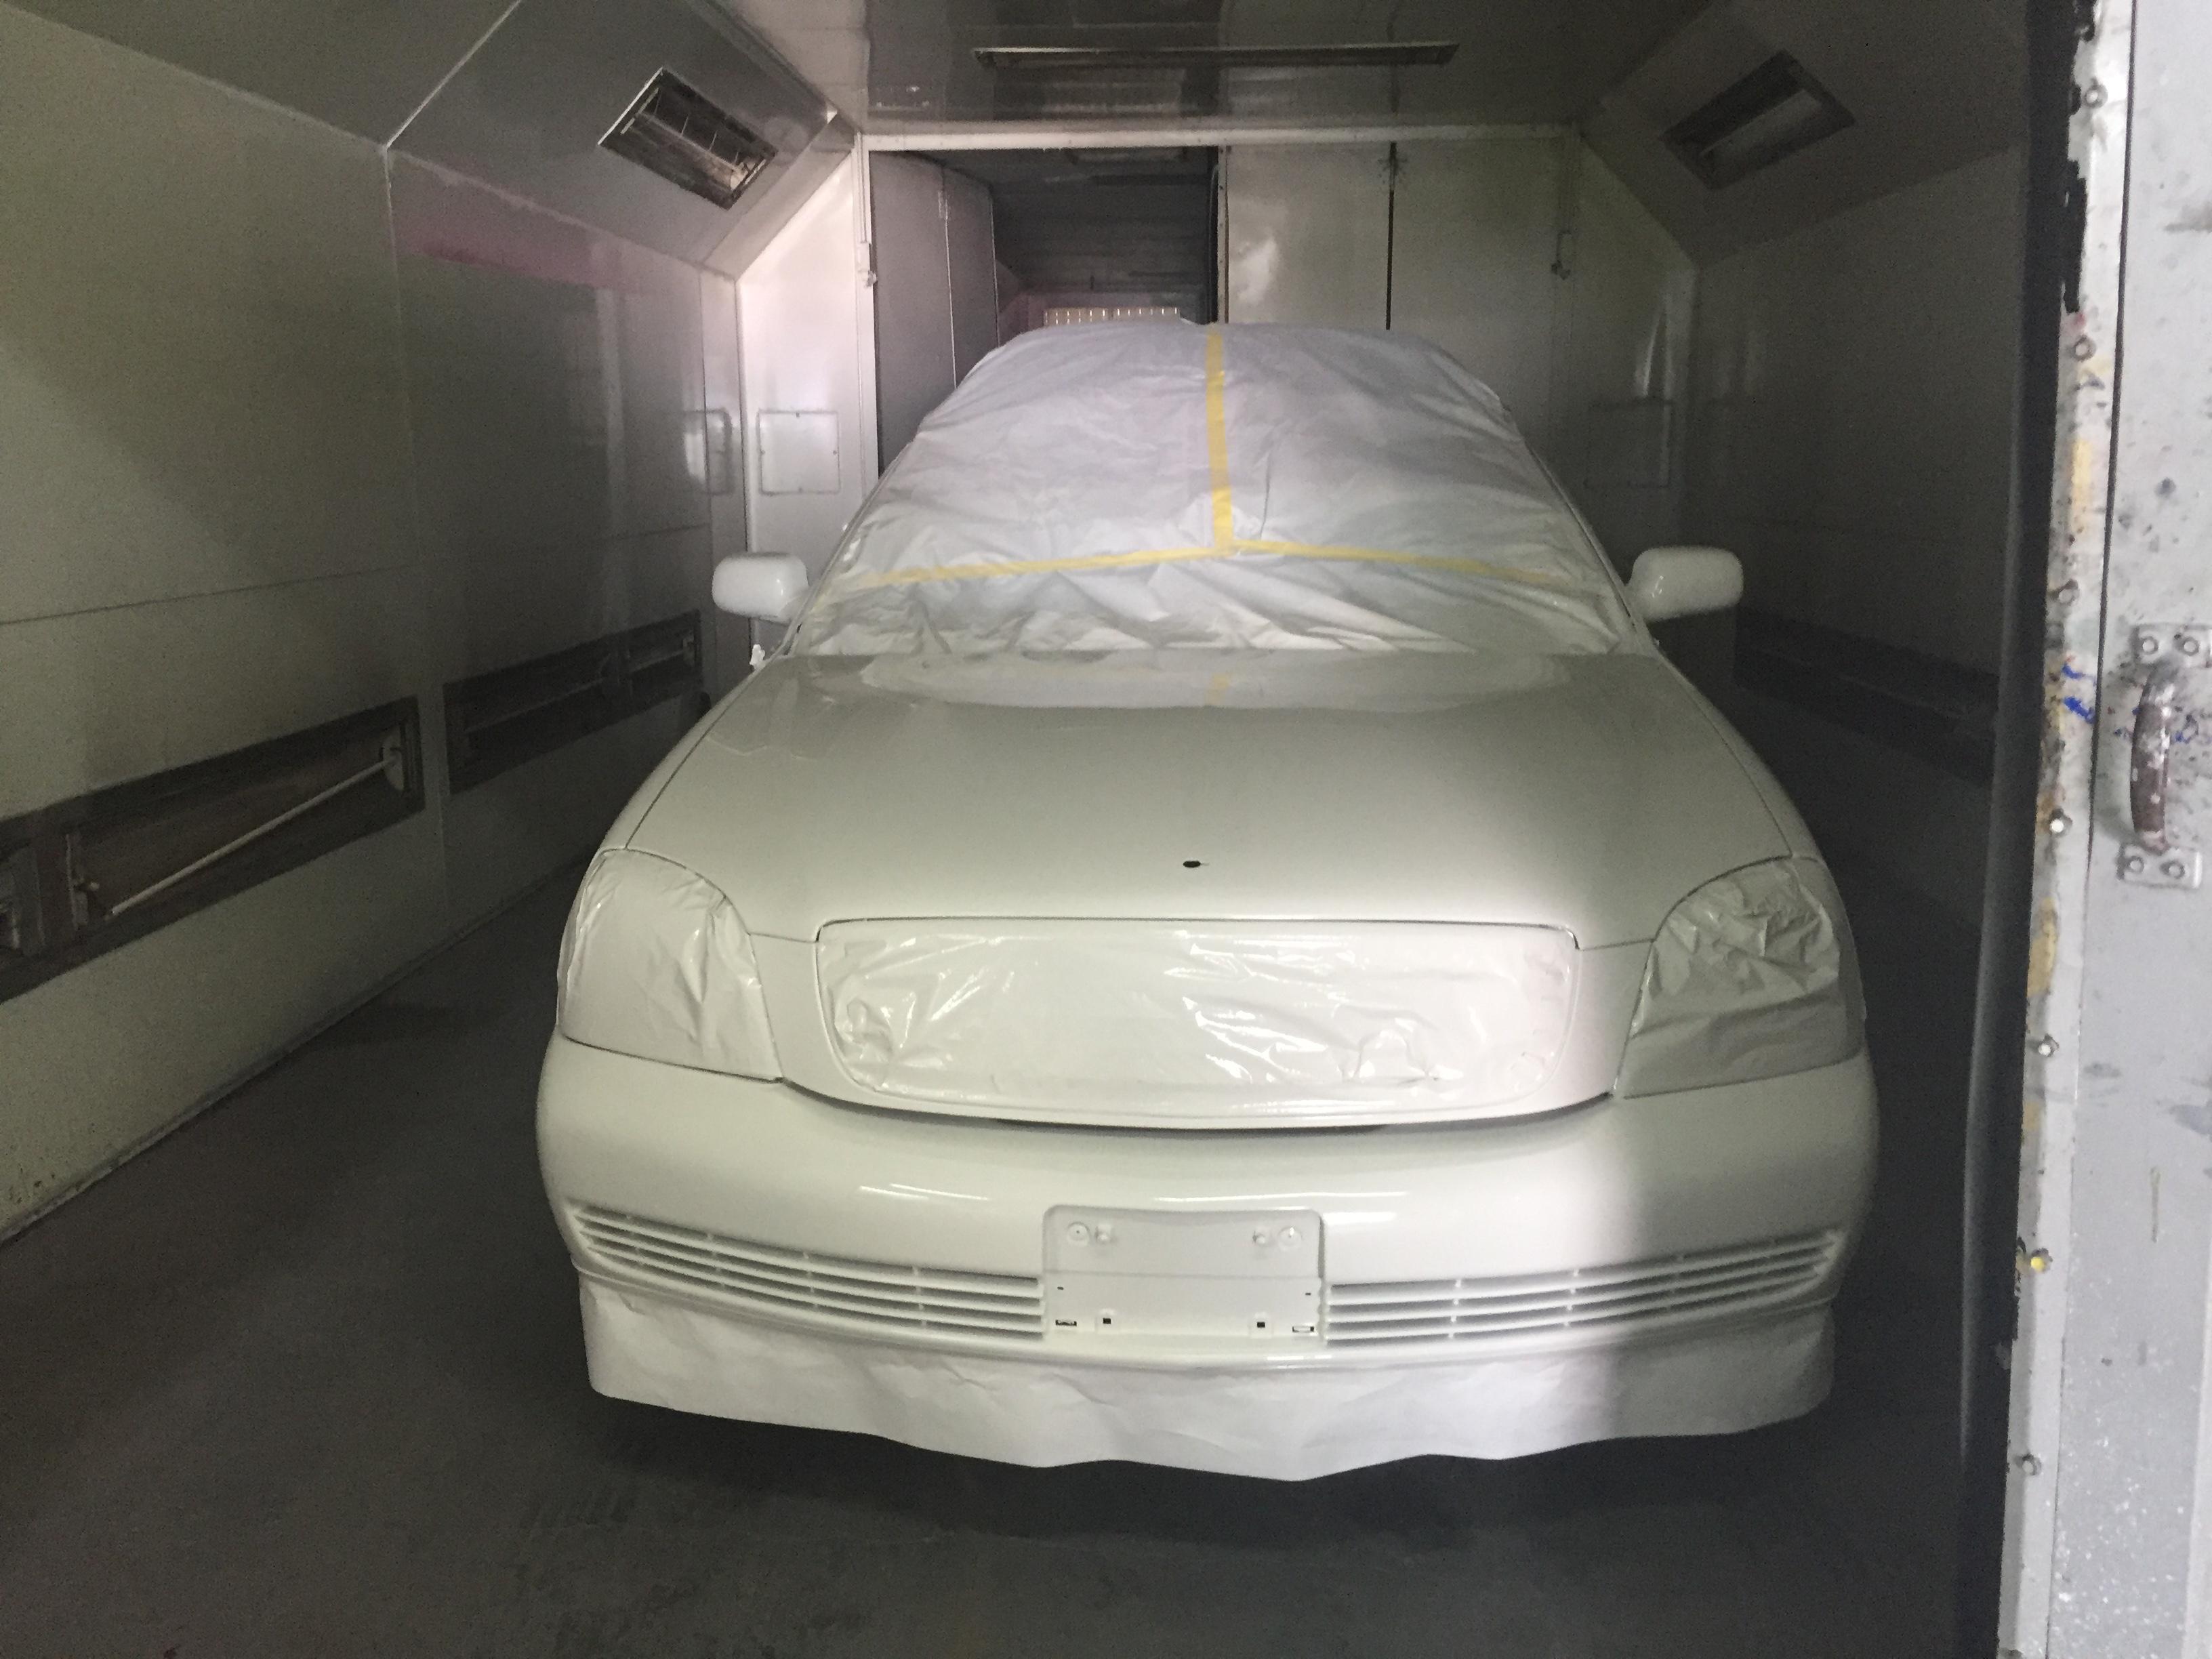 Autonation ford marietta 11